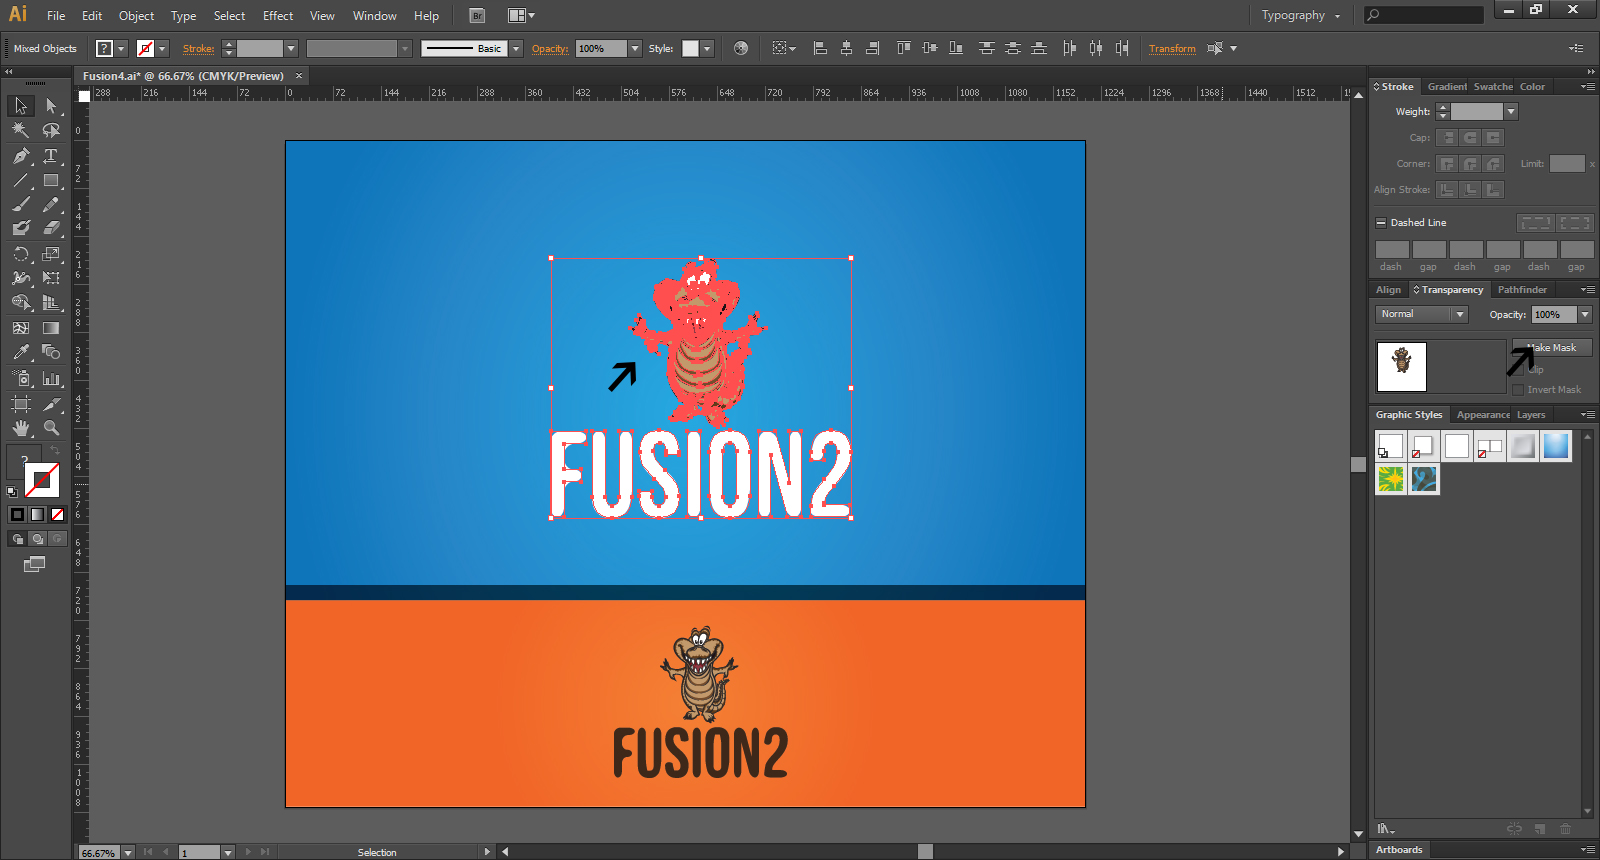 Graphic Design Skills - Fusion2